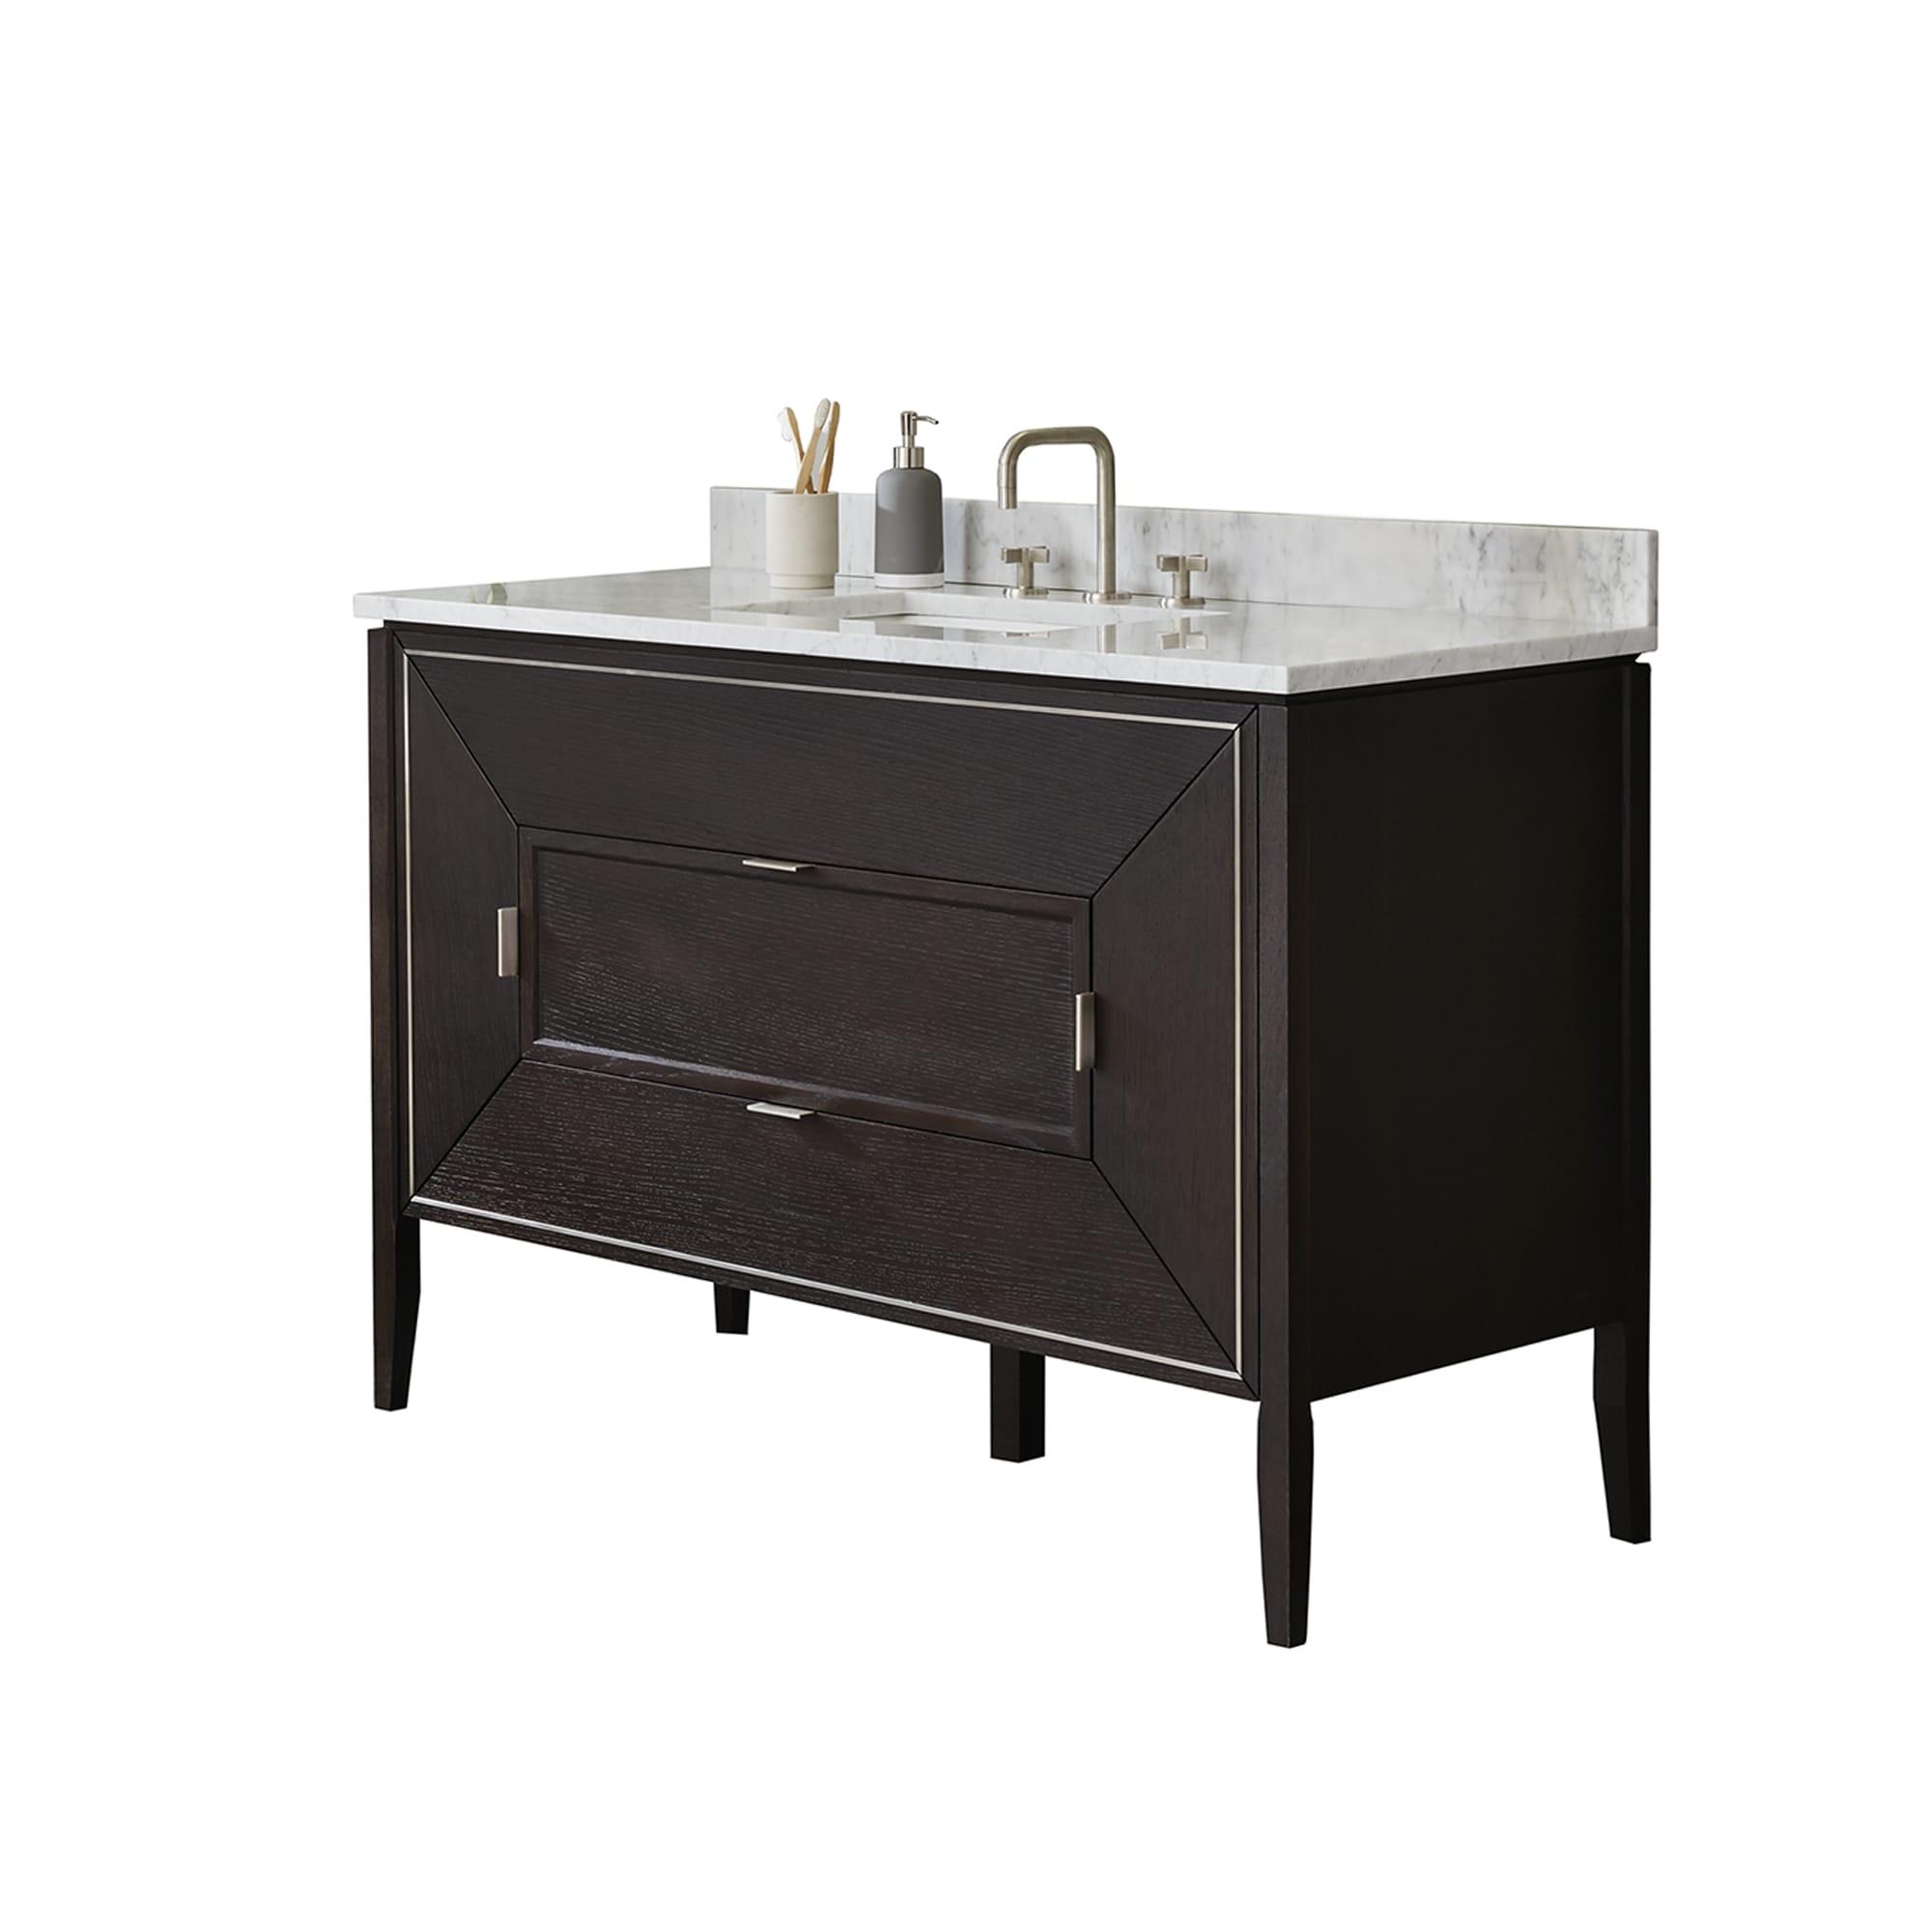 Ronbow 48 Amora Bathroom Vanity Cabinet Base In Oak Toscana Free Shipping Today 17096101